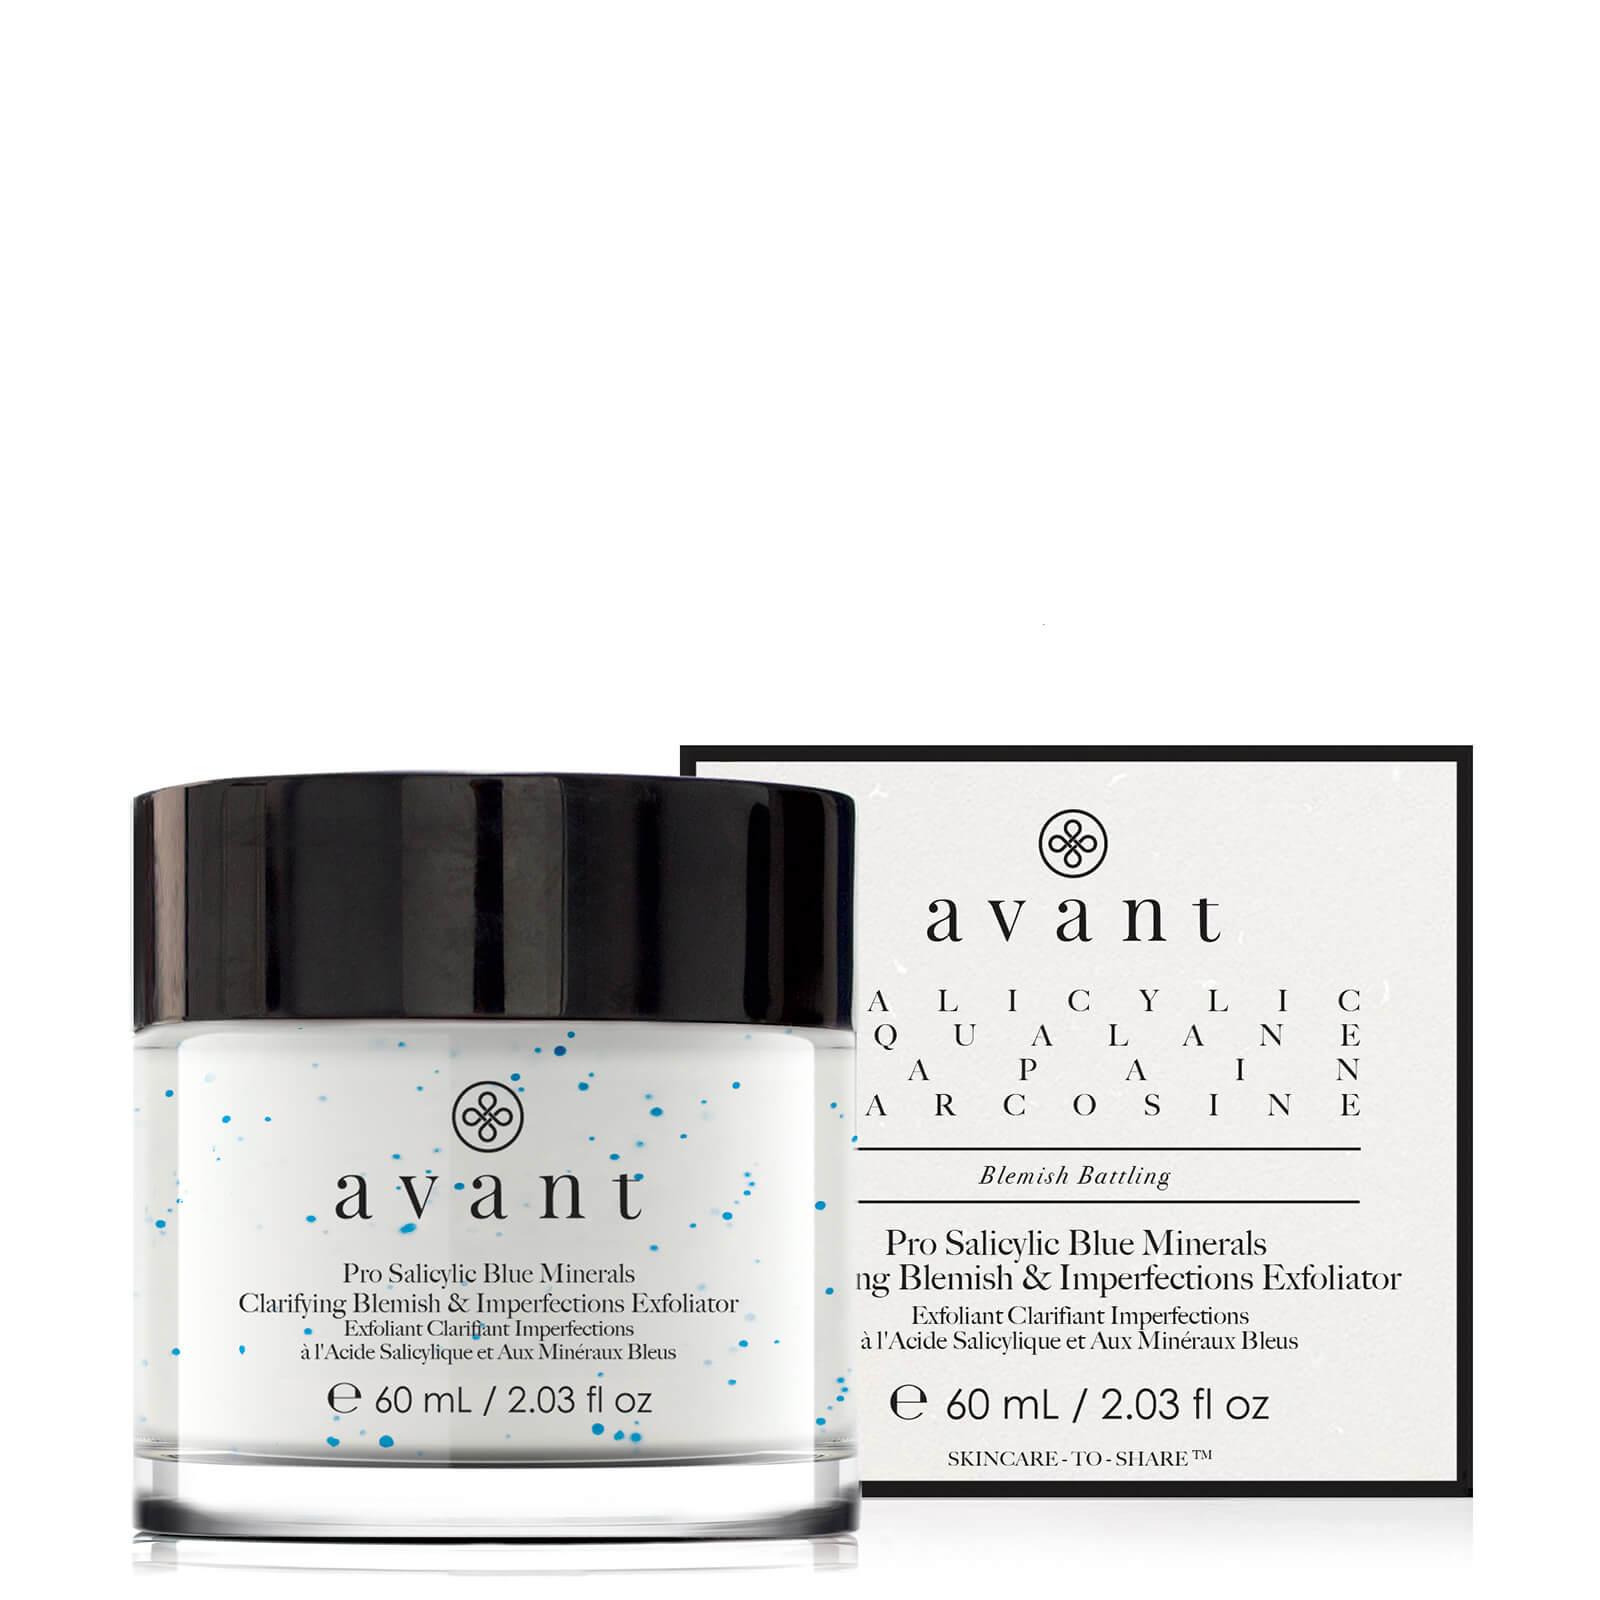 Купить Avant Skincare Pro Salicylic Blue Minerals Clarifying Blemish and Imperfections Exfoliator 60ml